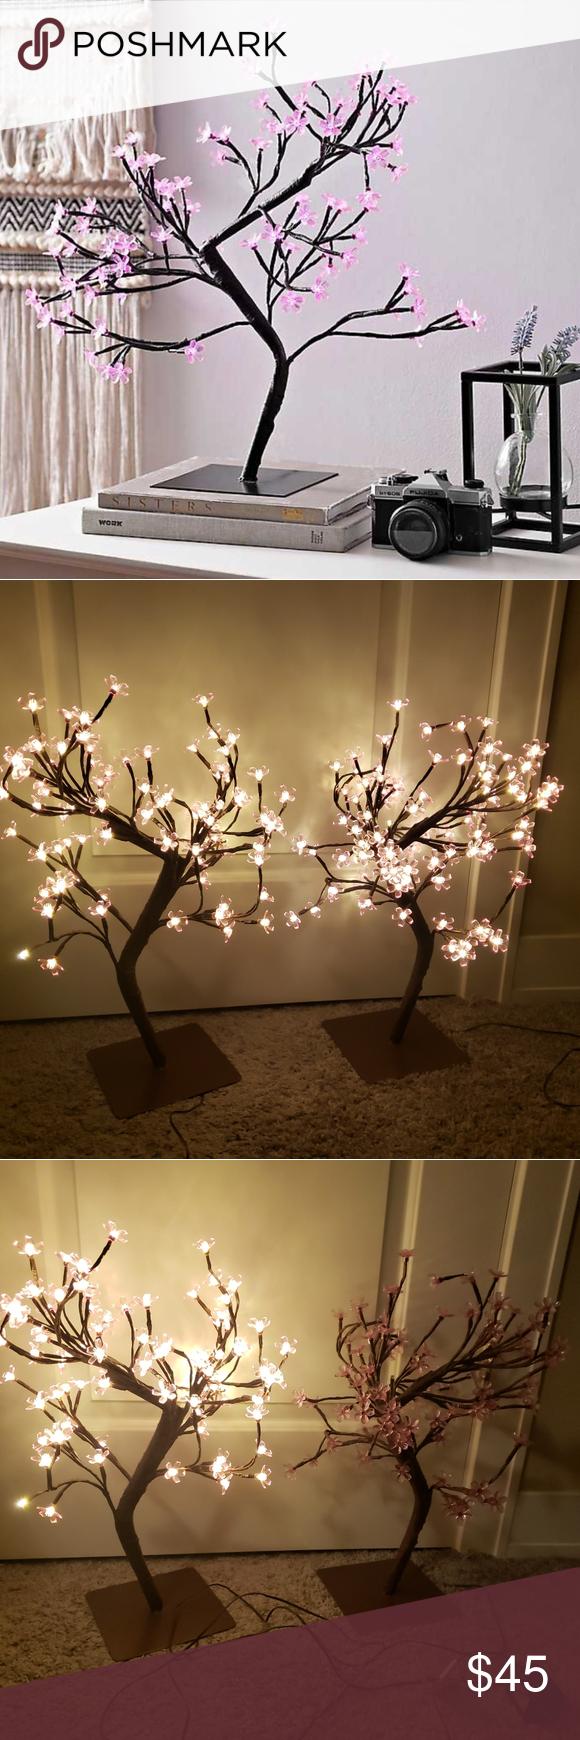 Pink Cherry Blossom Tree Lamp From Kirklands I Want This Pink Cherry Blossom Tree Tree Lamp Cherry Blossom Tree